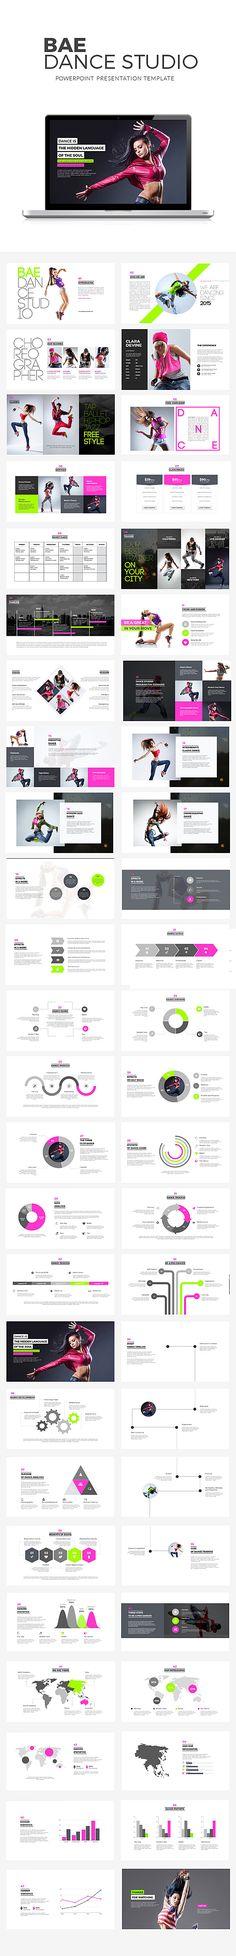 Bae Dance Powerpoint Presentation Template #design Download: http://graphicriver.net/item/bae-dance-powerpoint-presentation/11812983?ref=ksioks